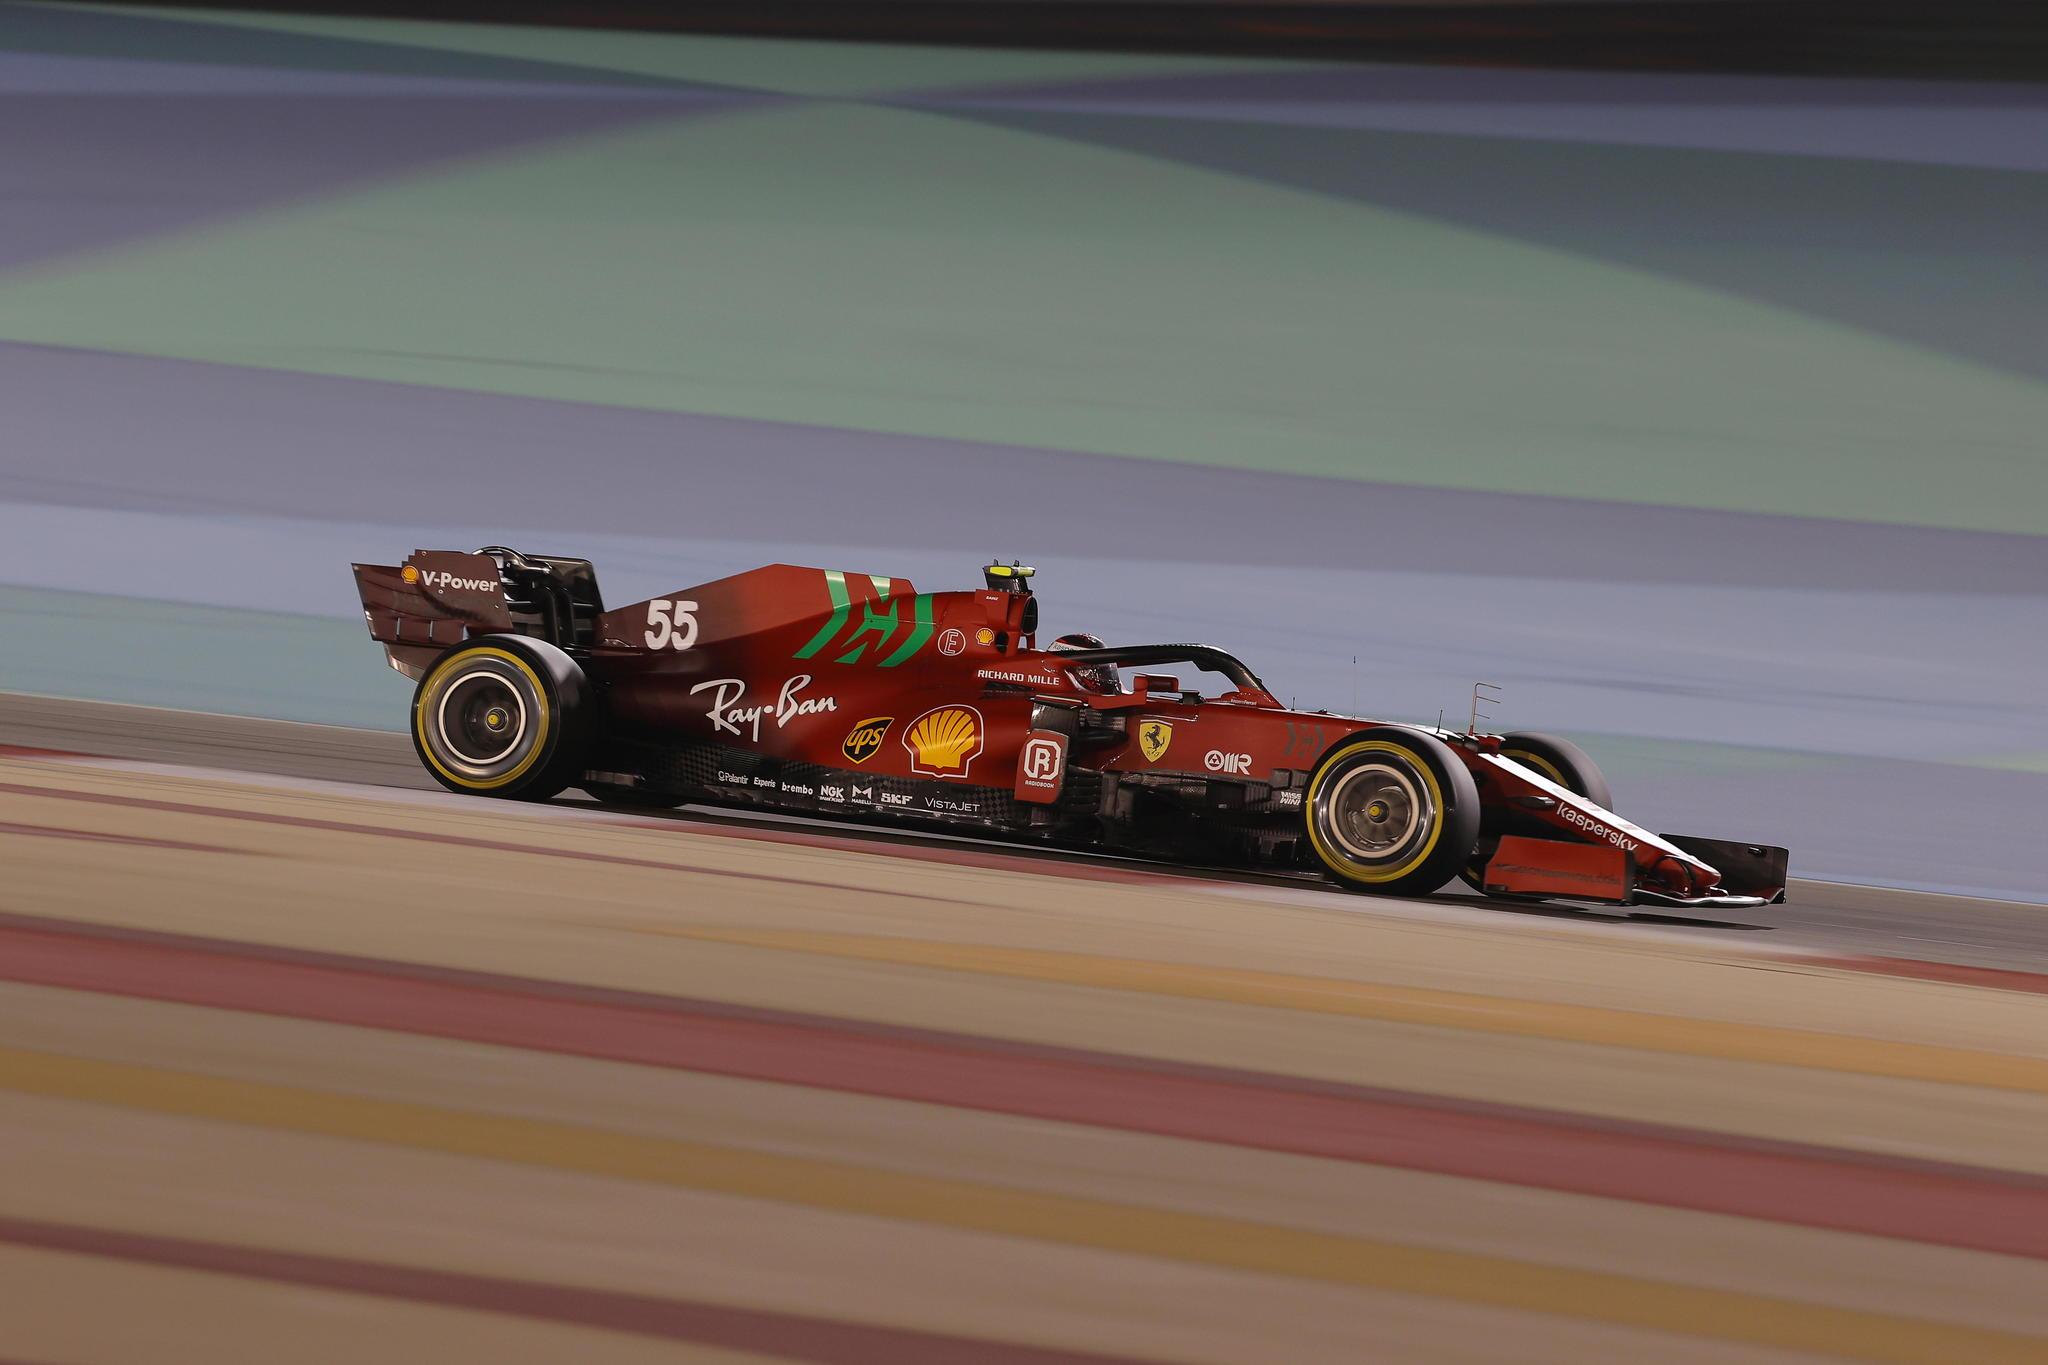 Sakhir (Bahrain), 28/03/2021.- Spanish Formula One driver Carlos lt;HIT gt;Sainz lt;/HIT gt; of Scuderia Ferrari Mission Winnow in action during the 2021 Formula One Grand Prix of Bahrain at the Sakhir circuit near Manama, Bahrain, 28 March 2021. (Fórmula Uno, Bahrein) EFE/EPA/VALDRIN XHEMAJ